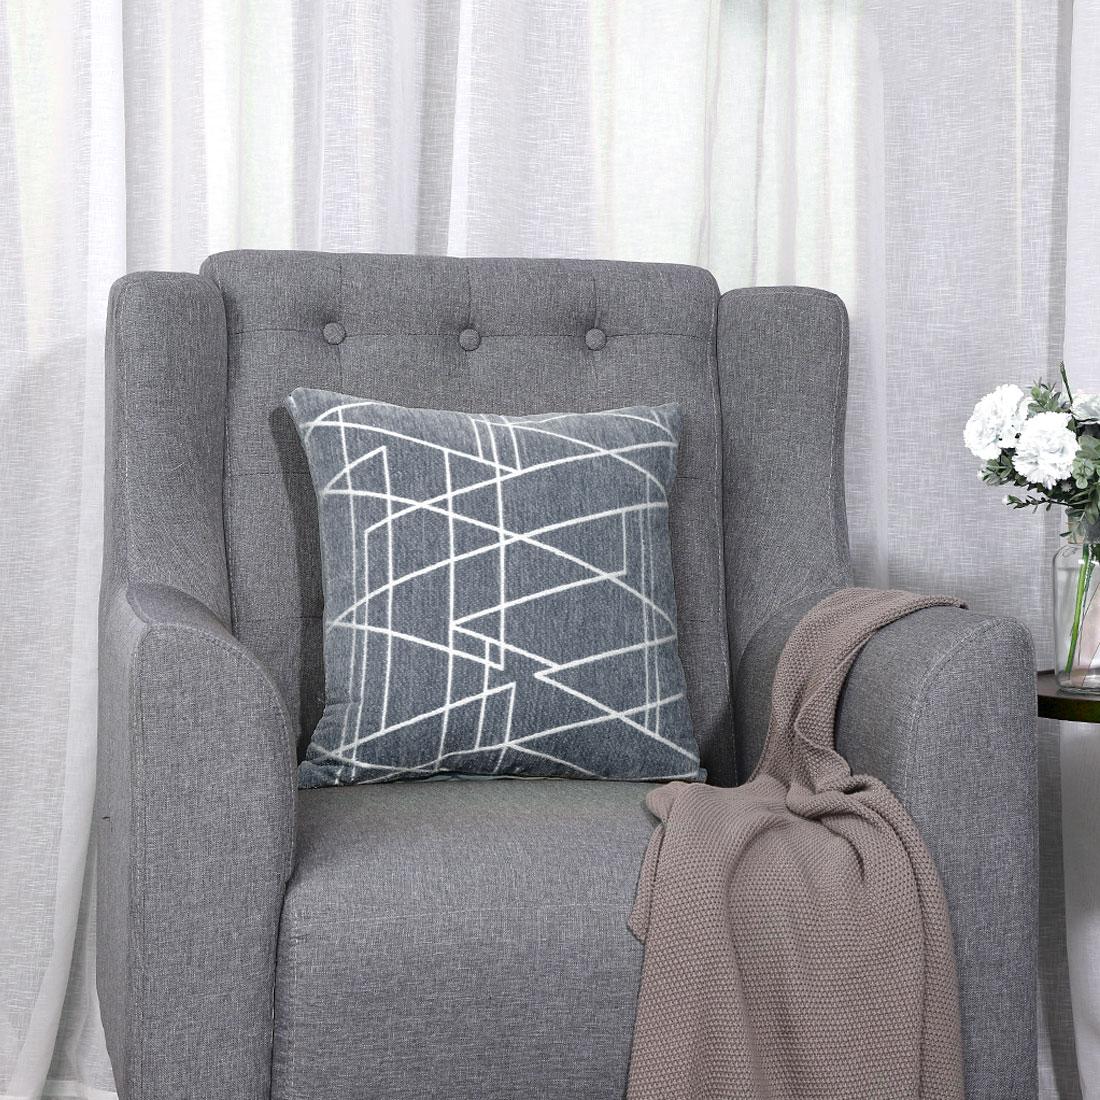 Decoration-Pillow-Covers-Cotton-Linen-Throw-Pillow-Case-Cushion-Cover thumbnail 46